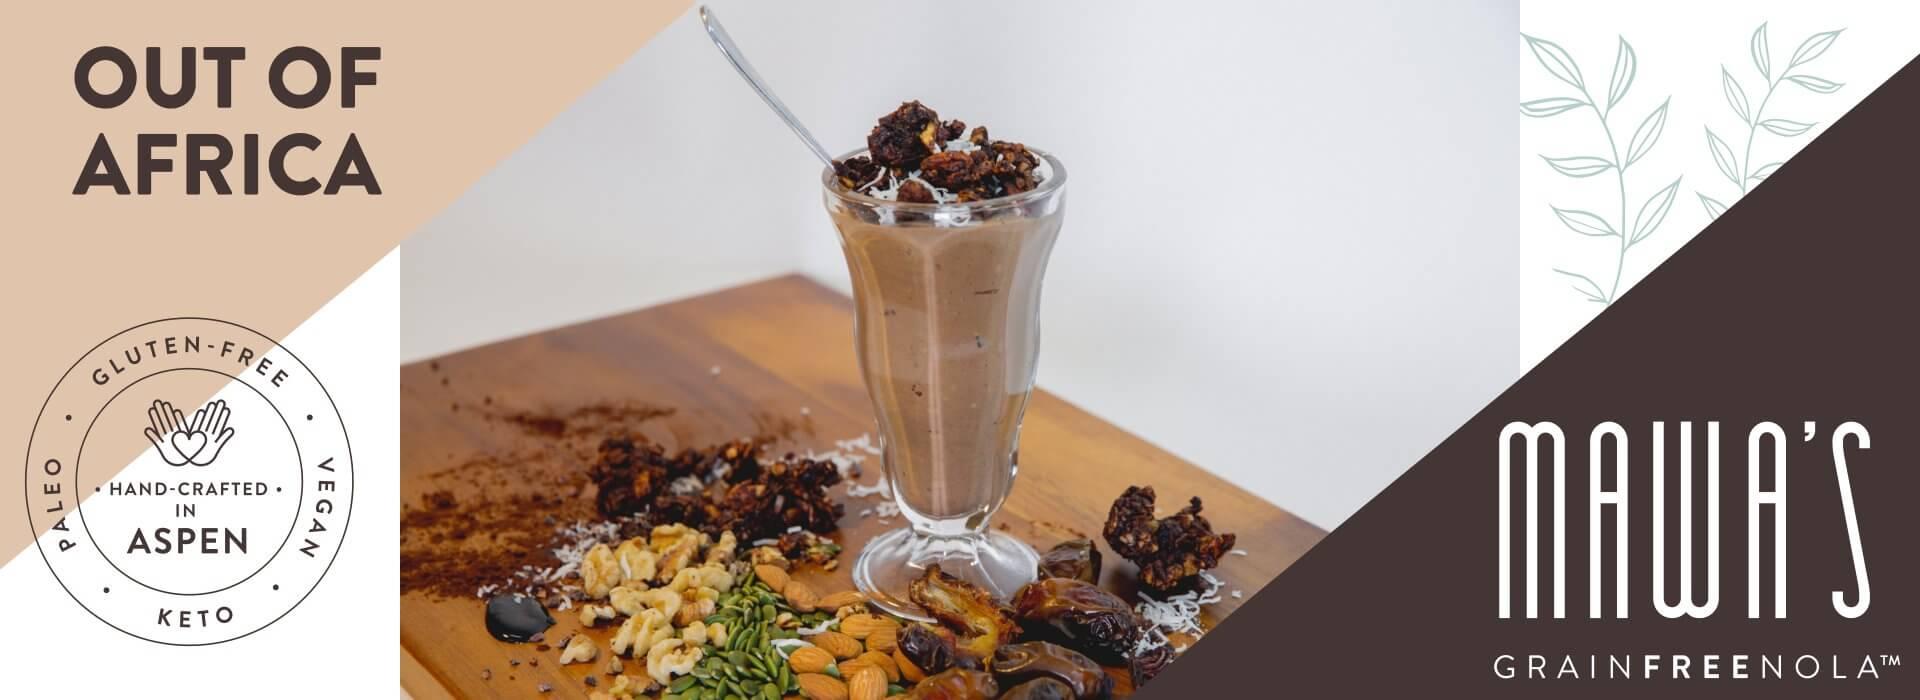 Mawa's GrainFreeNola - Out of Africa Paleo, Vegan, Gluten-Free Granola